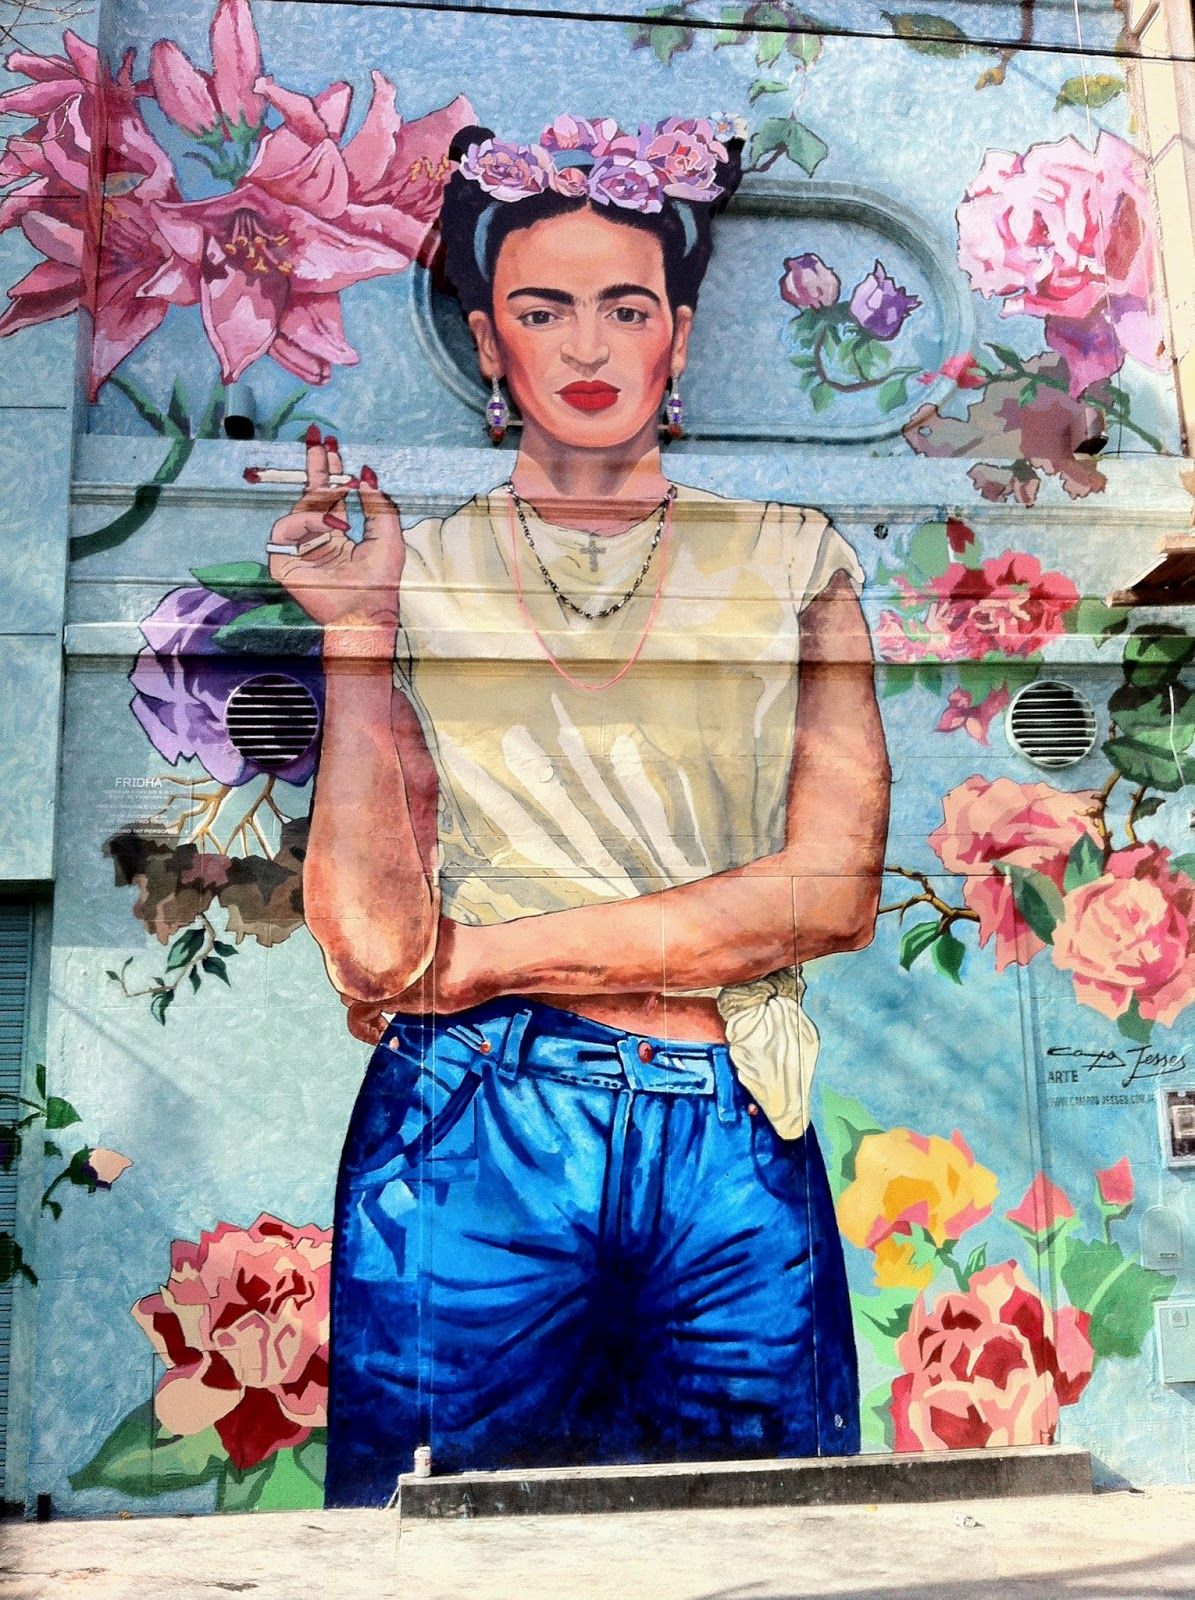 Mural Frida Kahlo Buenos Aires Direccion